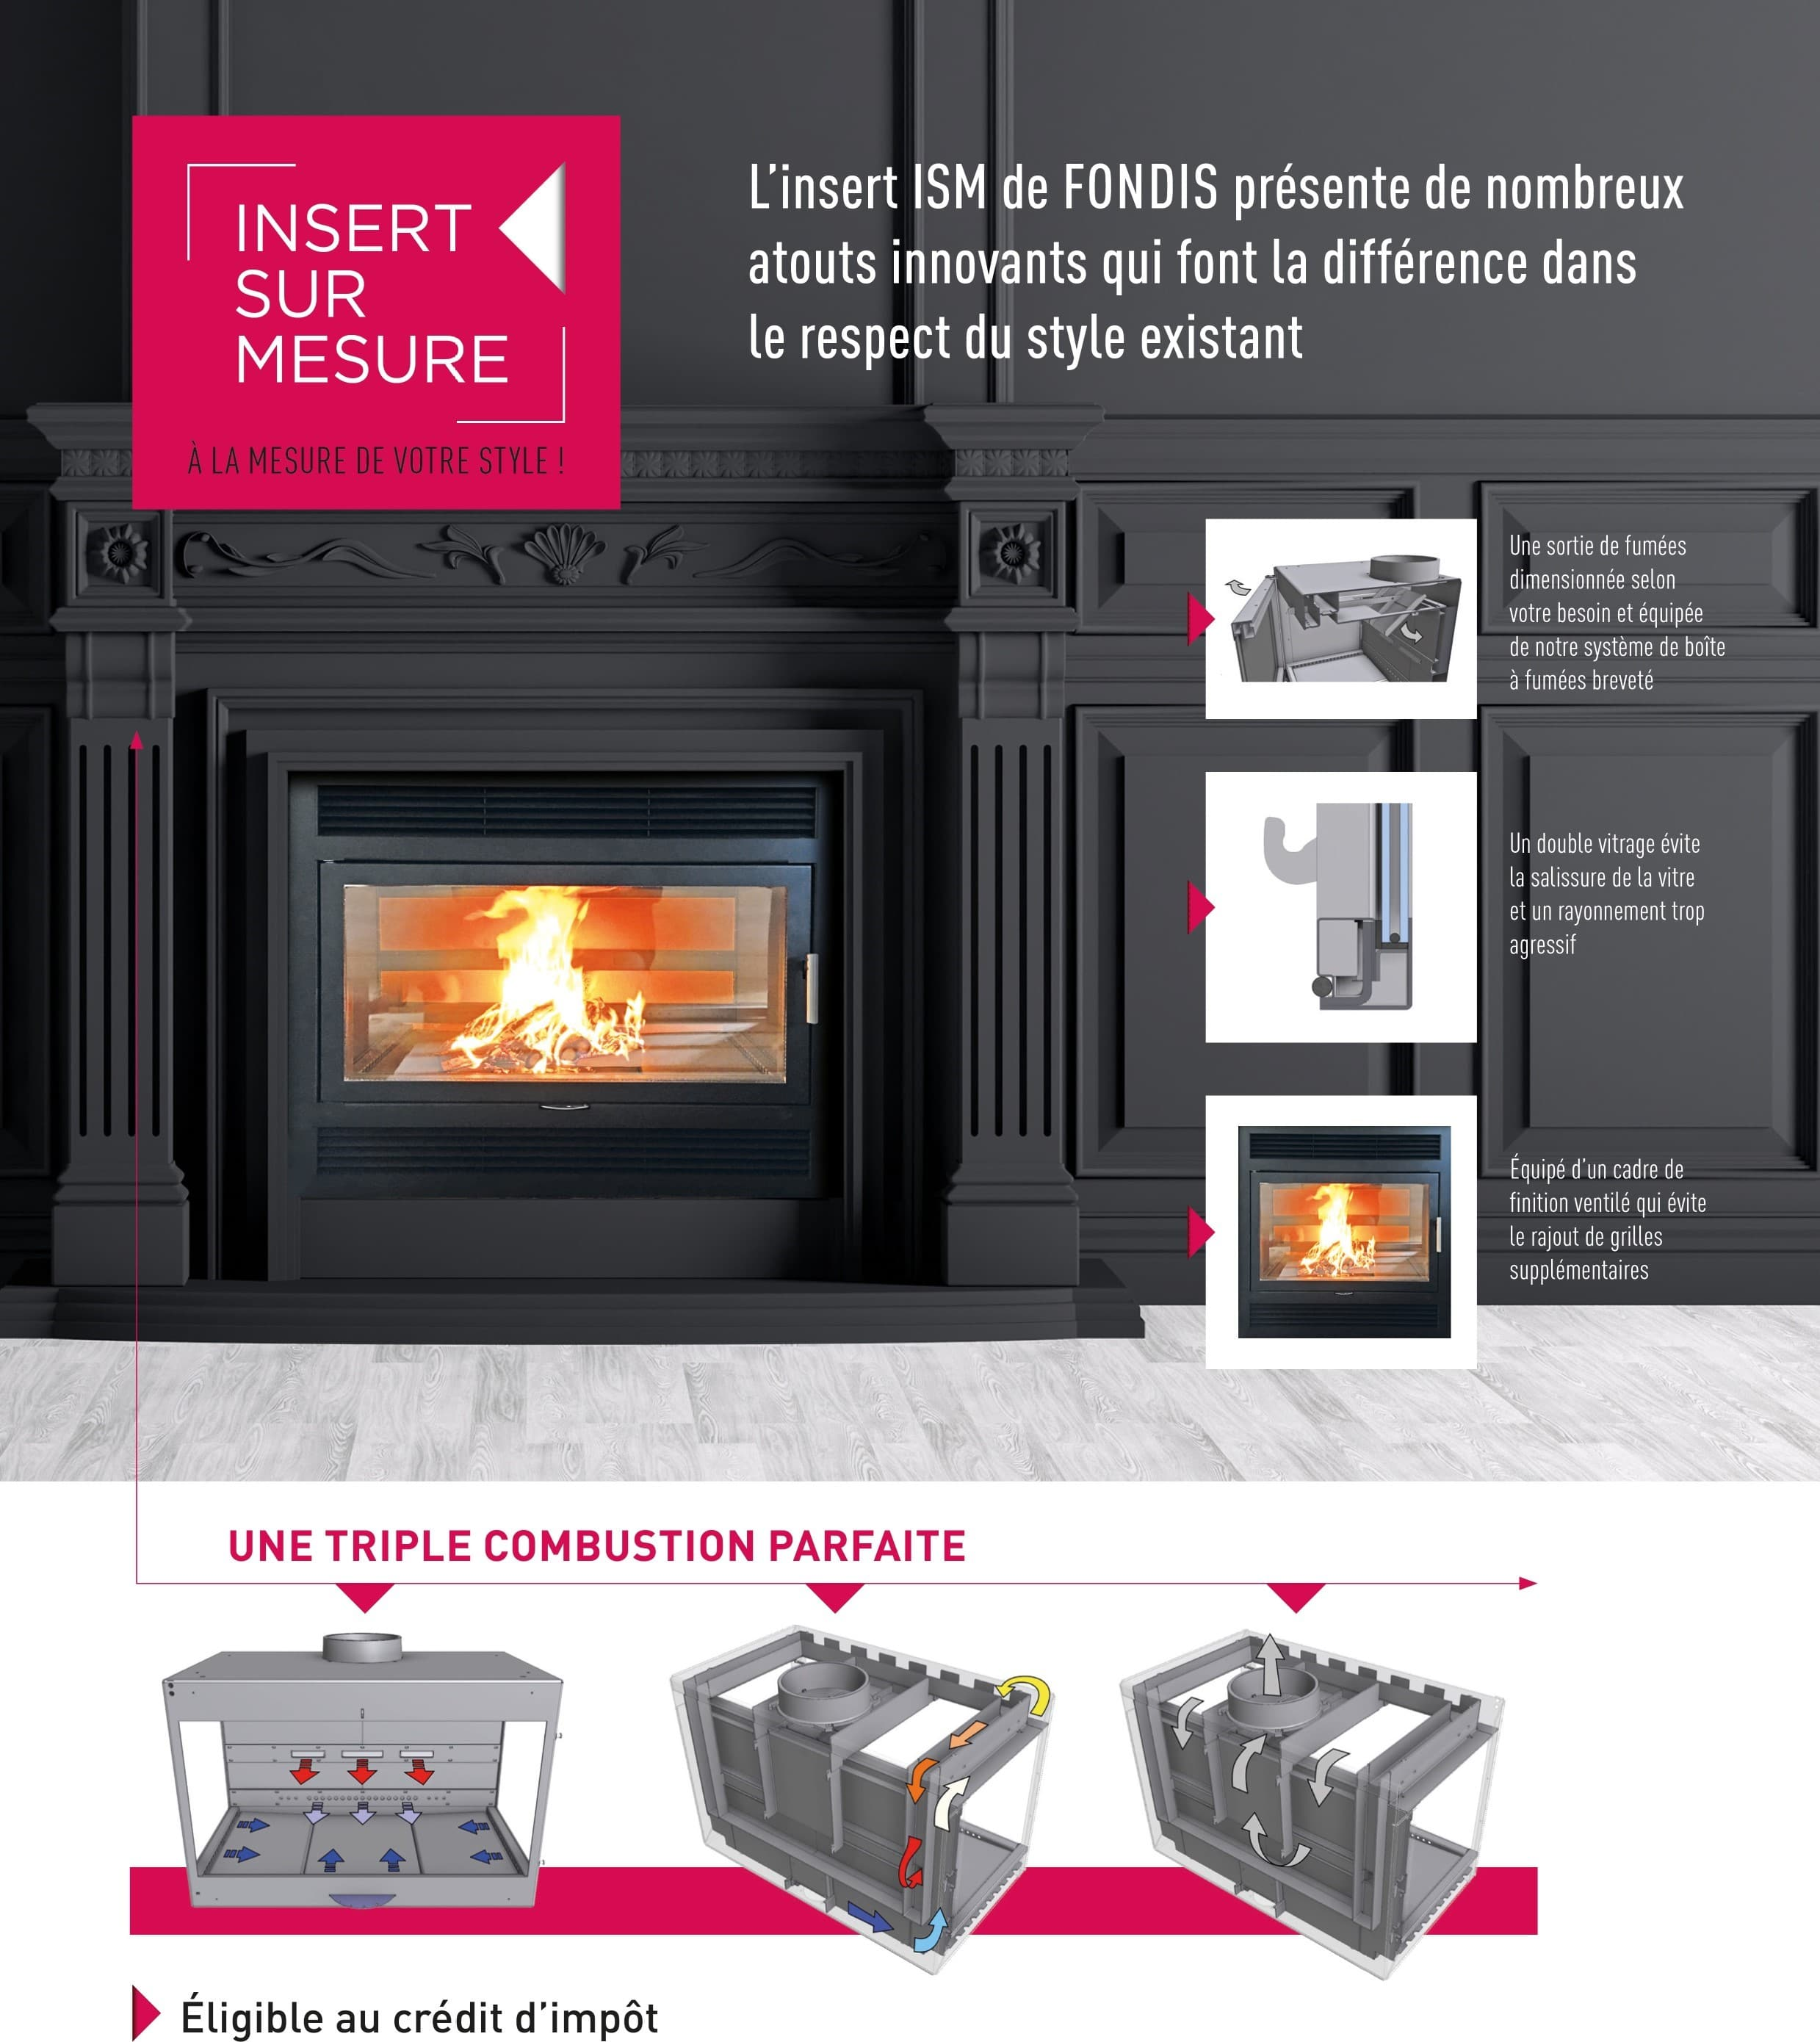 insert bois sur mesure ambiance confort eco. Black Bedroom Furniture Sets. Home Design Ideas